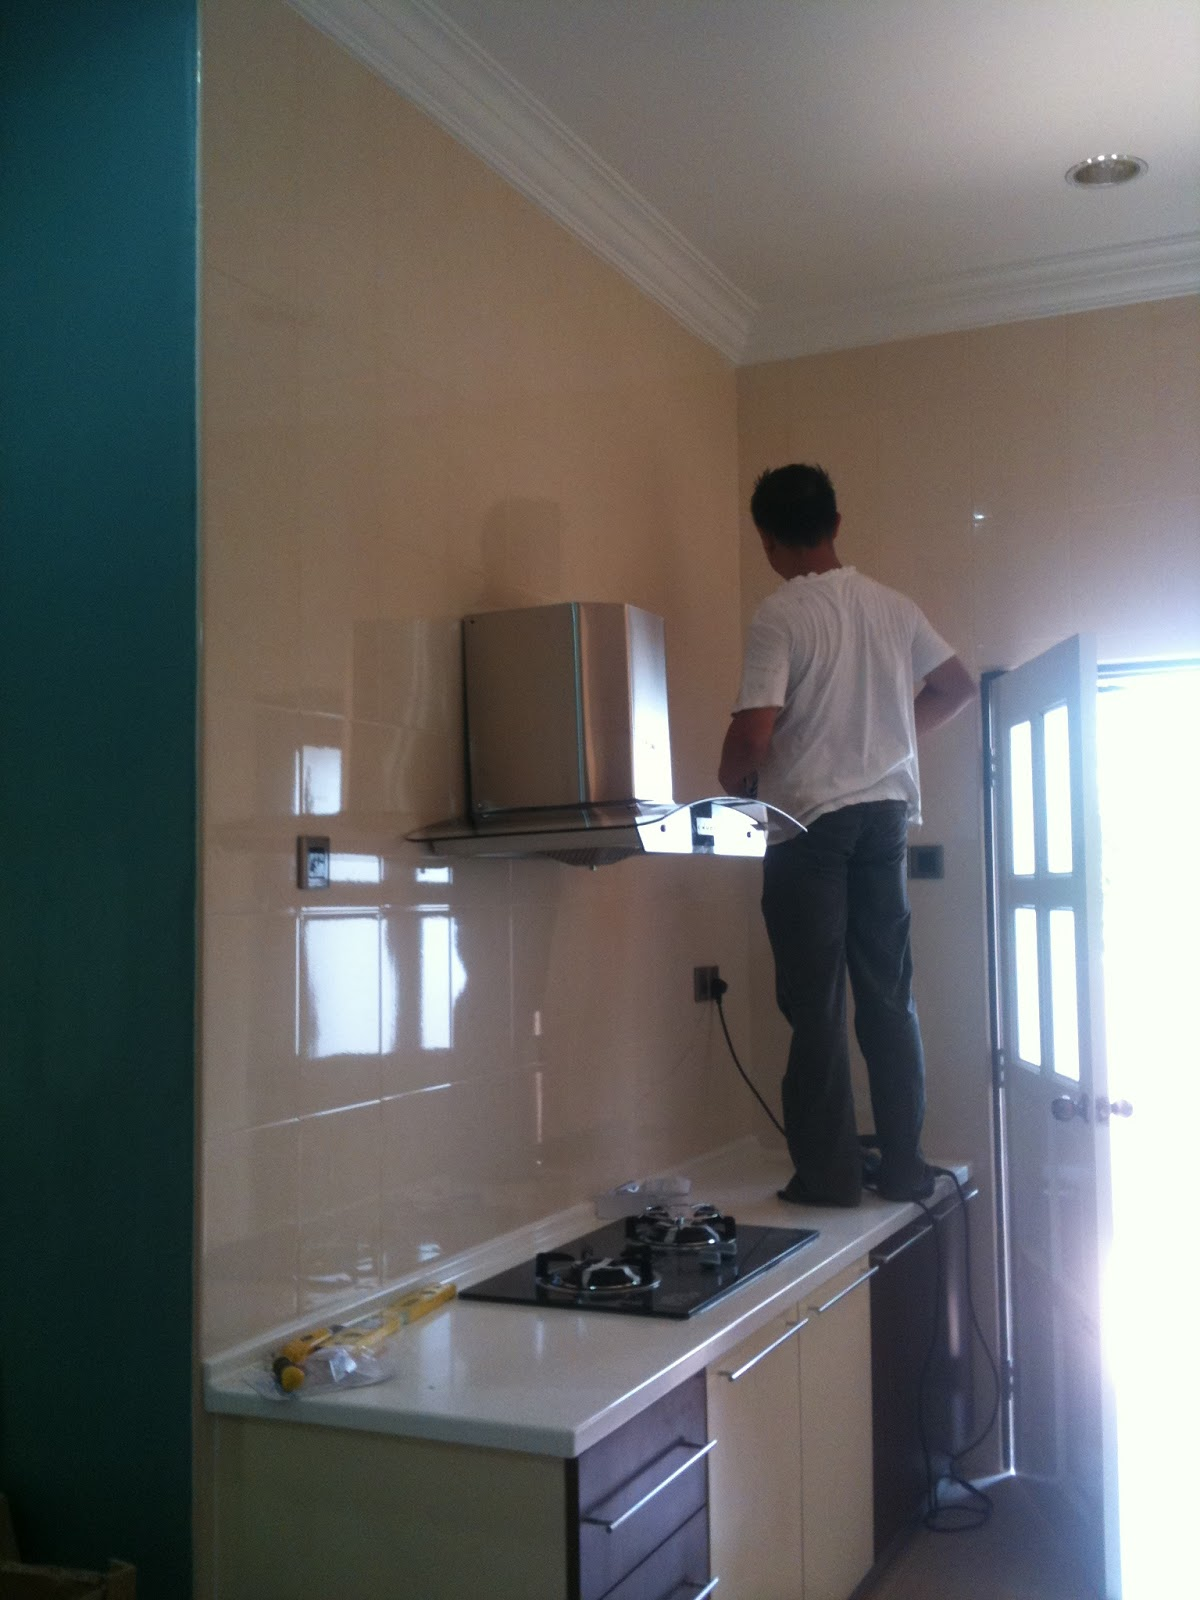 Galerialam Project Cikgu B Kitchen Cabinet Cara Pasang Hob Dapur Desainrumahid Com Hood Rubine